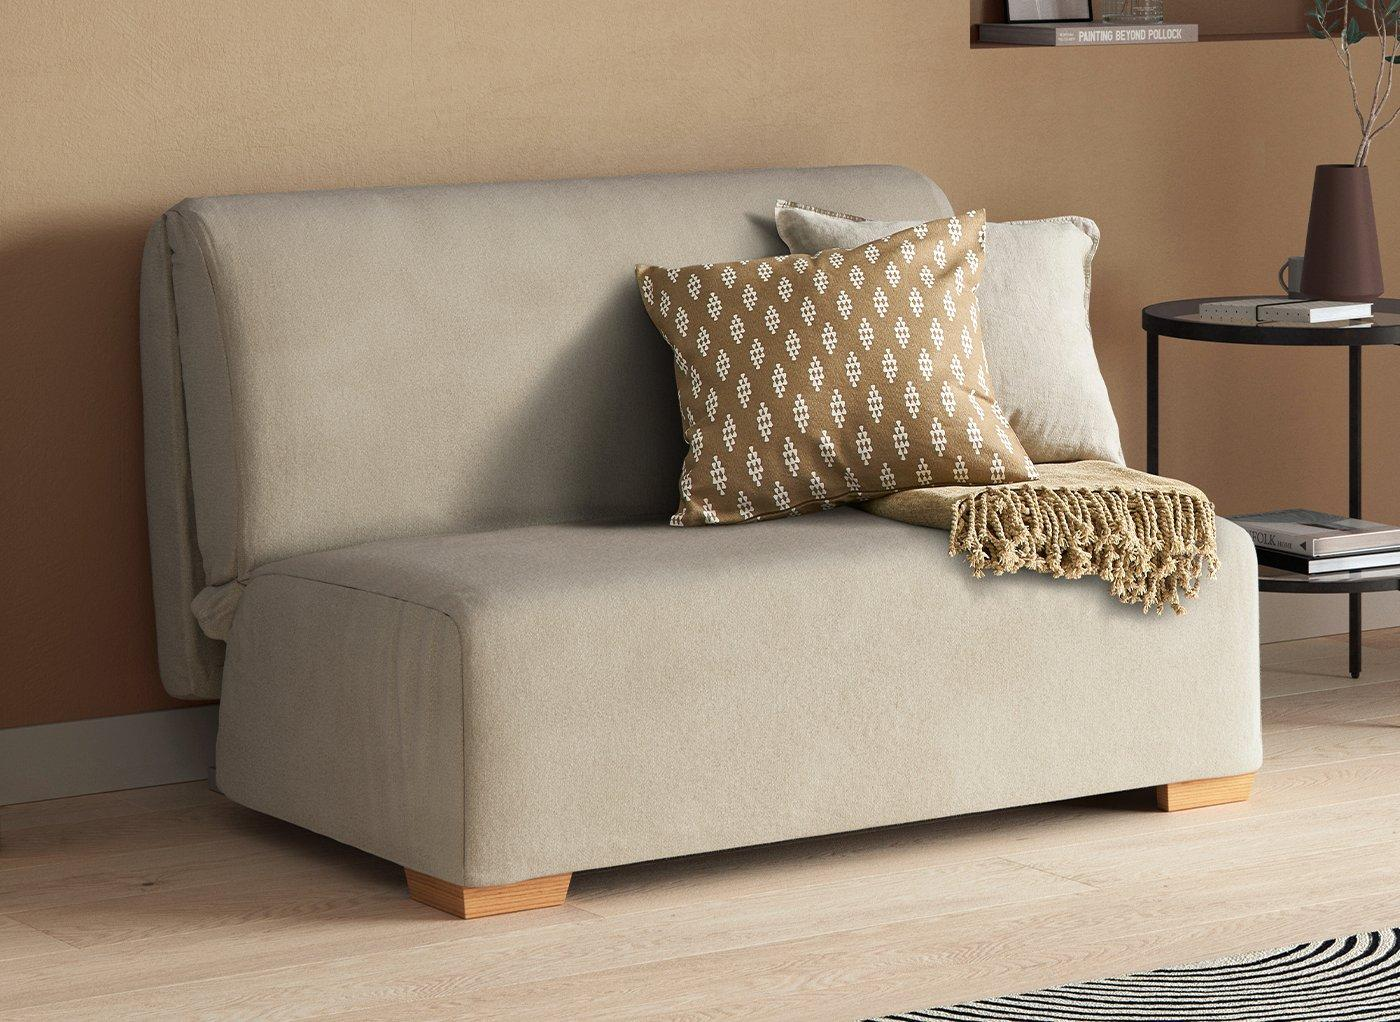 Cork 2 Seater 4'6 A-Frame Sofa Bed - Cream Double